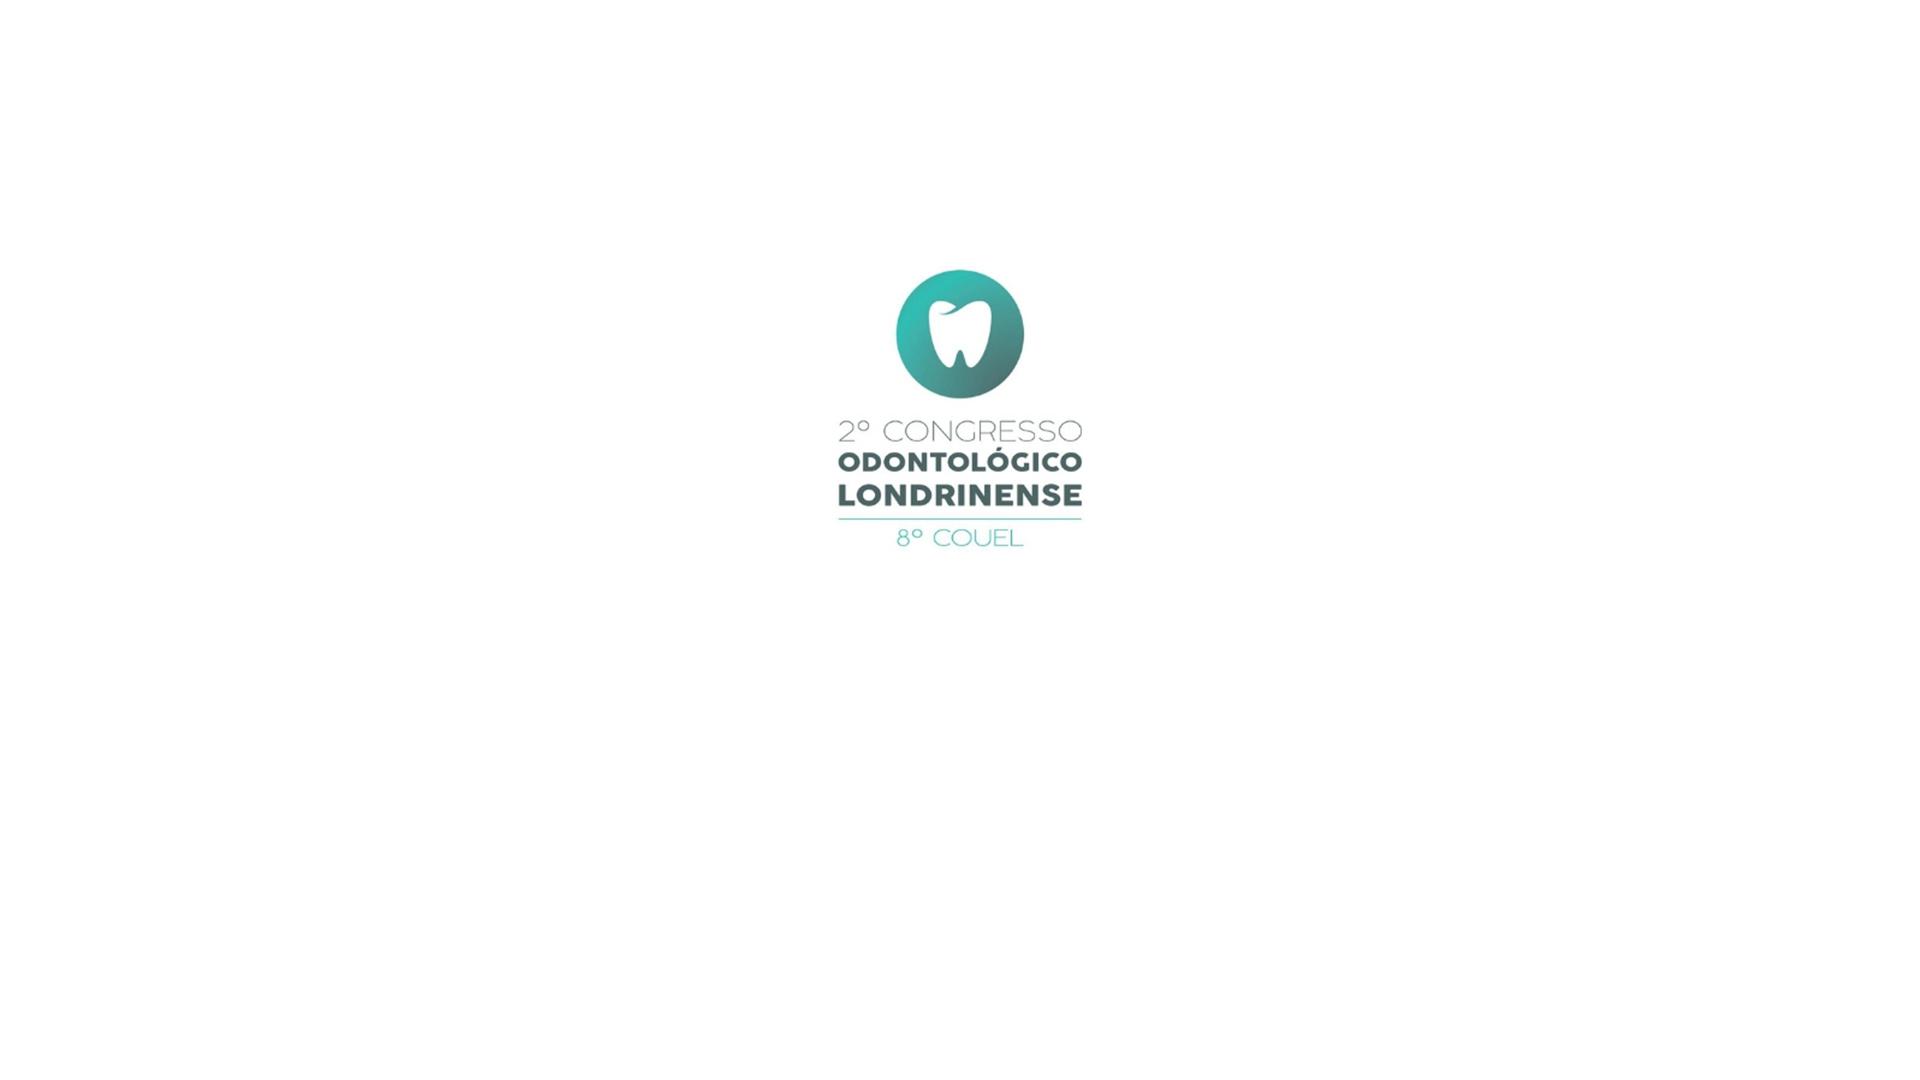 2º Congresso Odontológico Londrinense